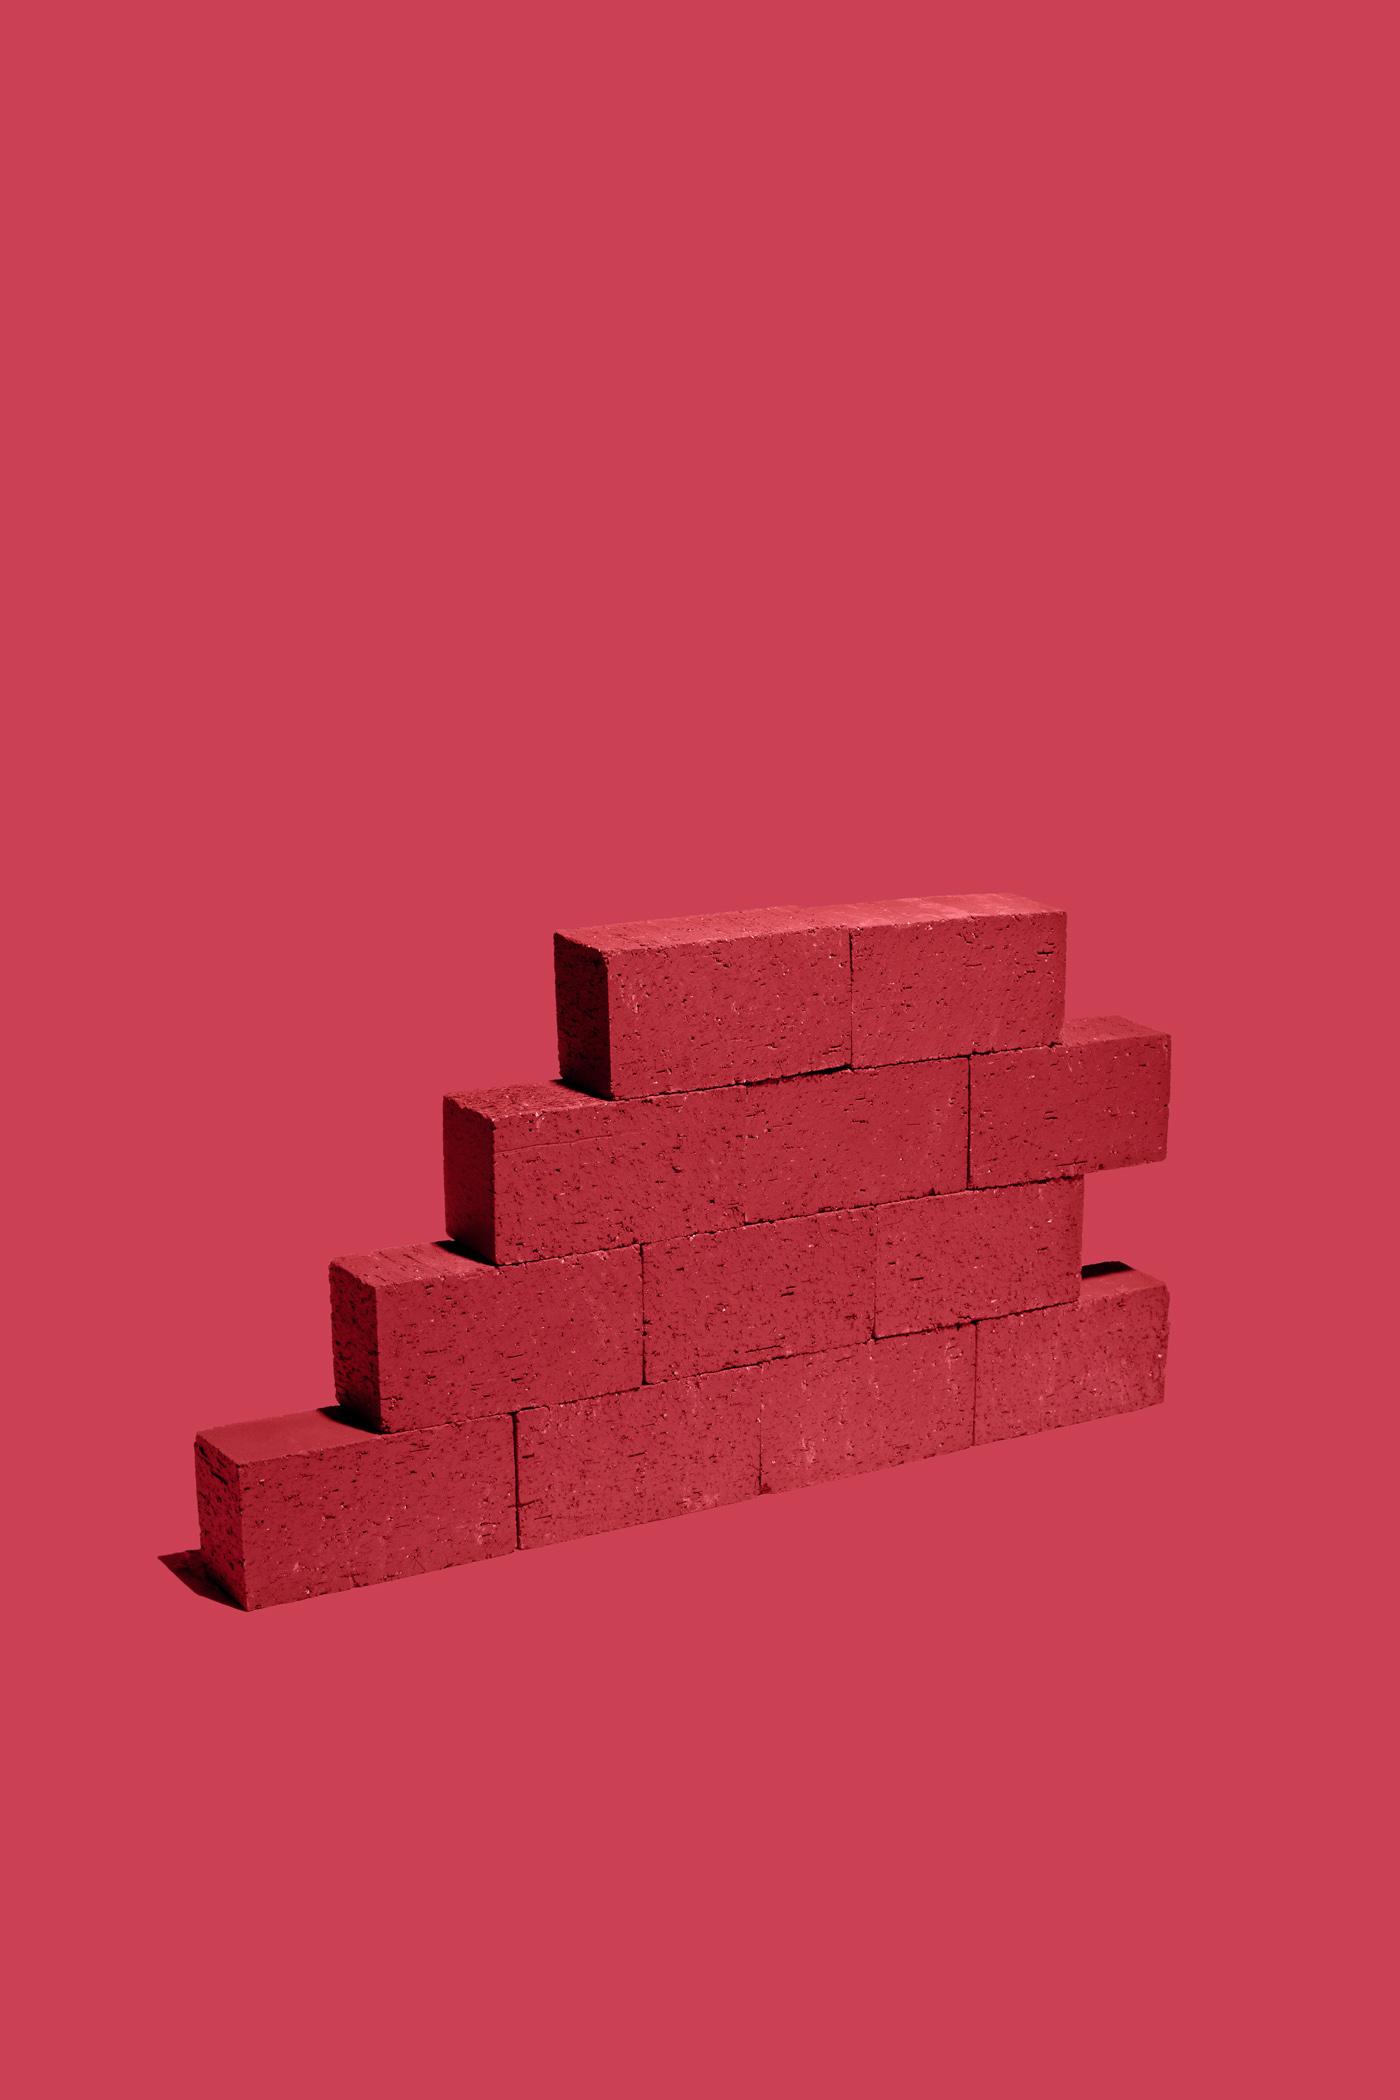 brickred